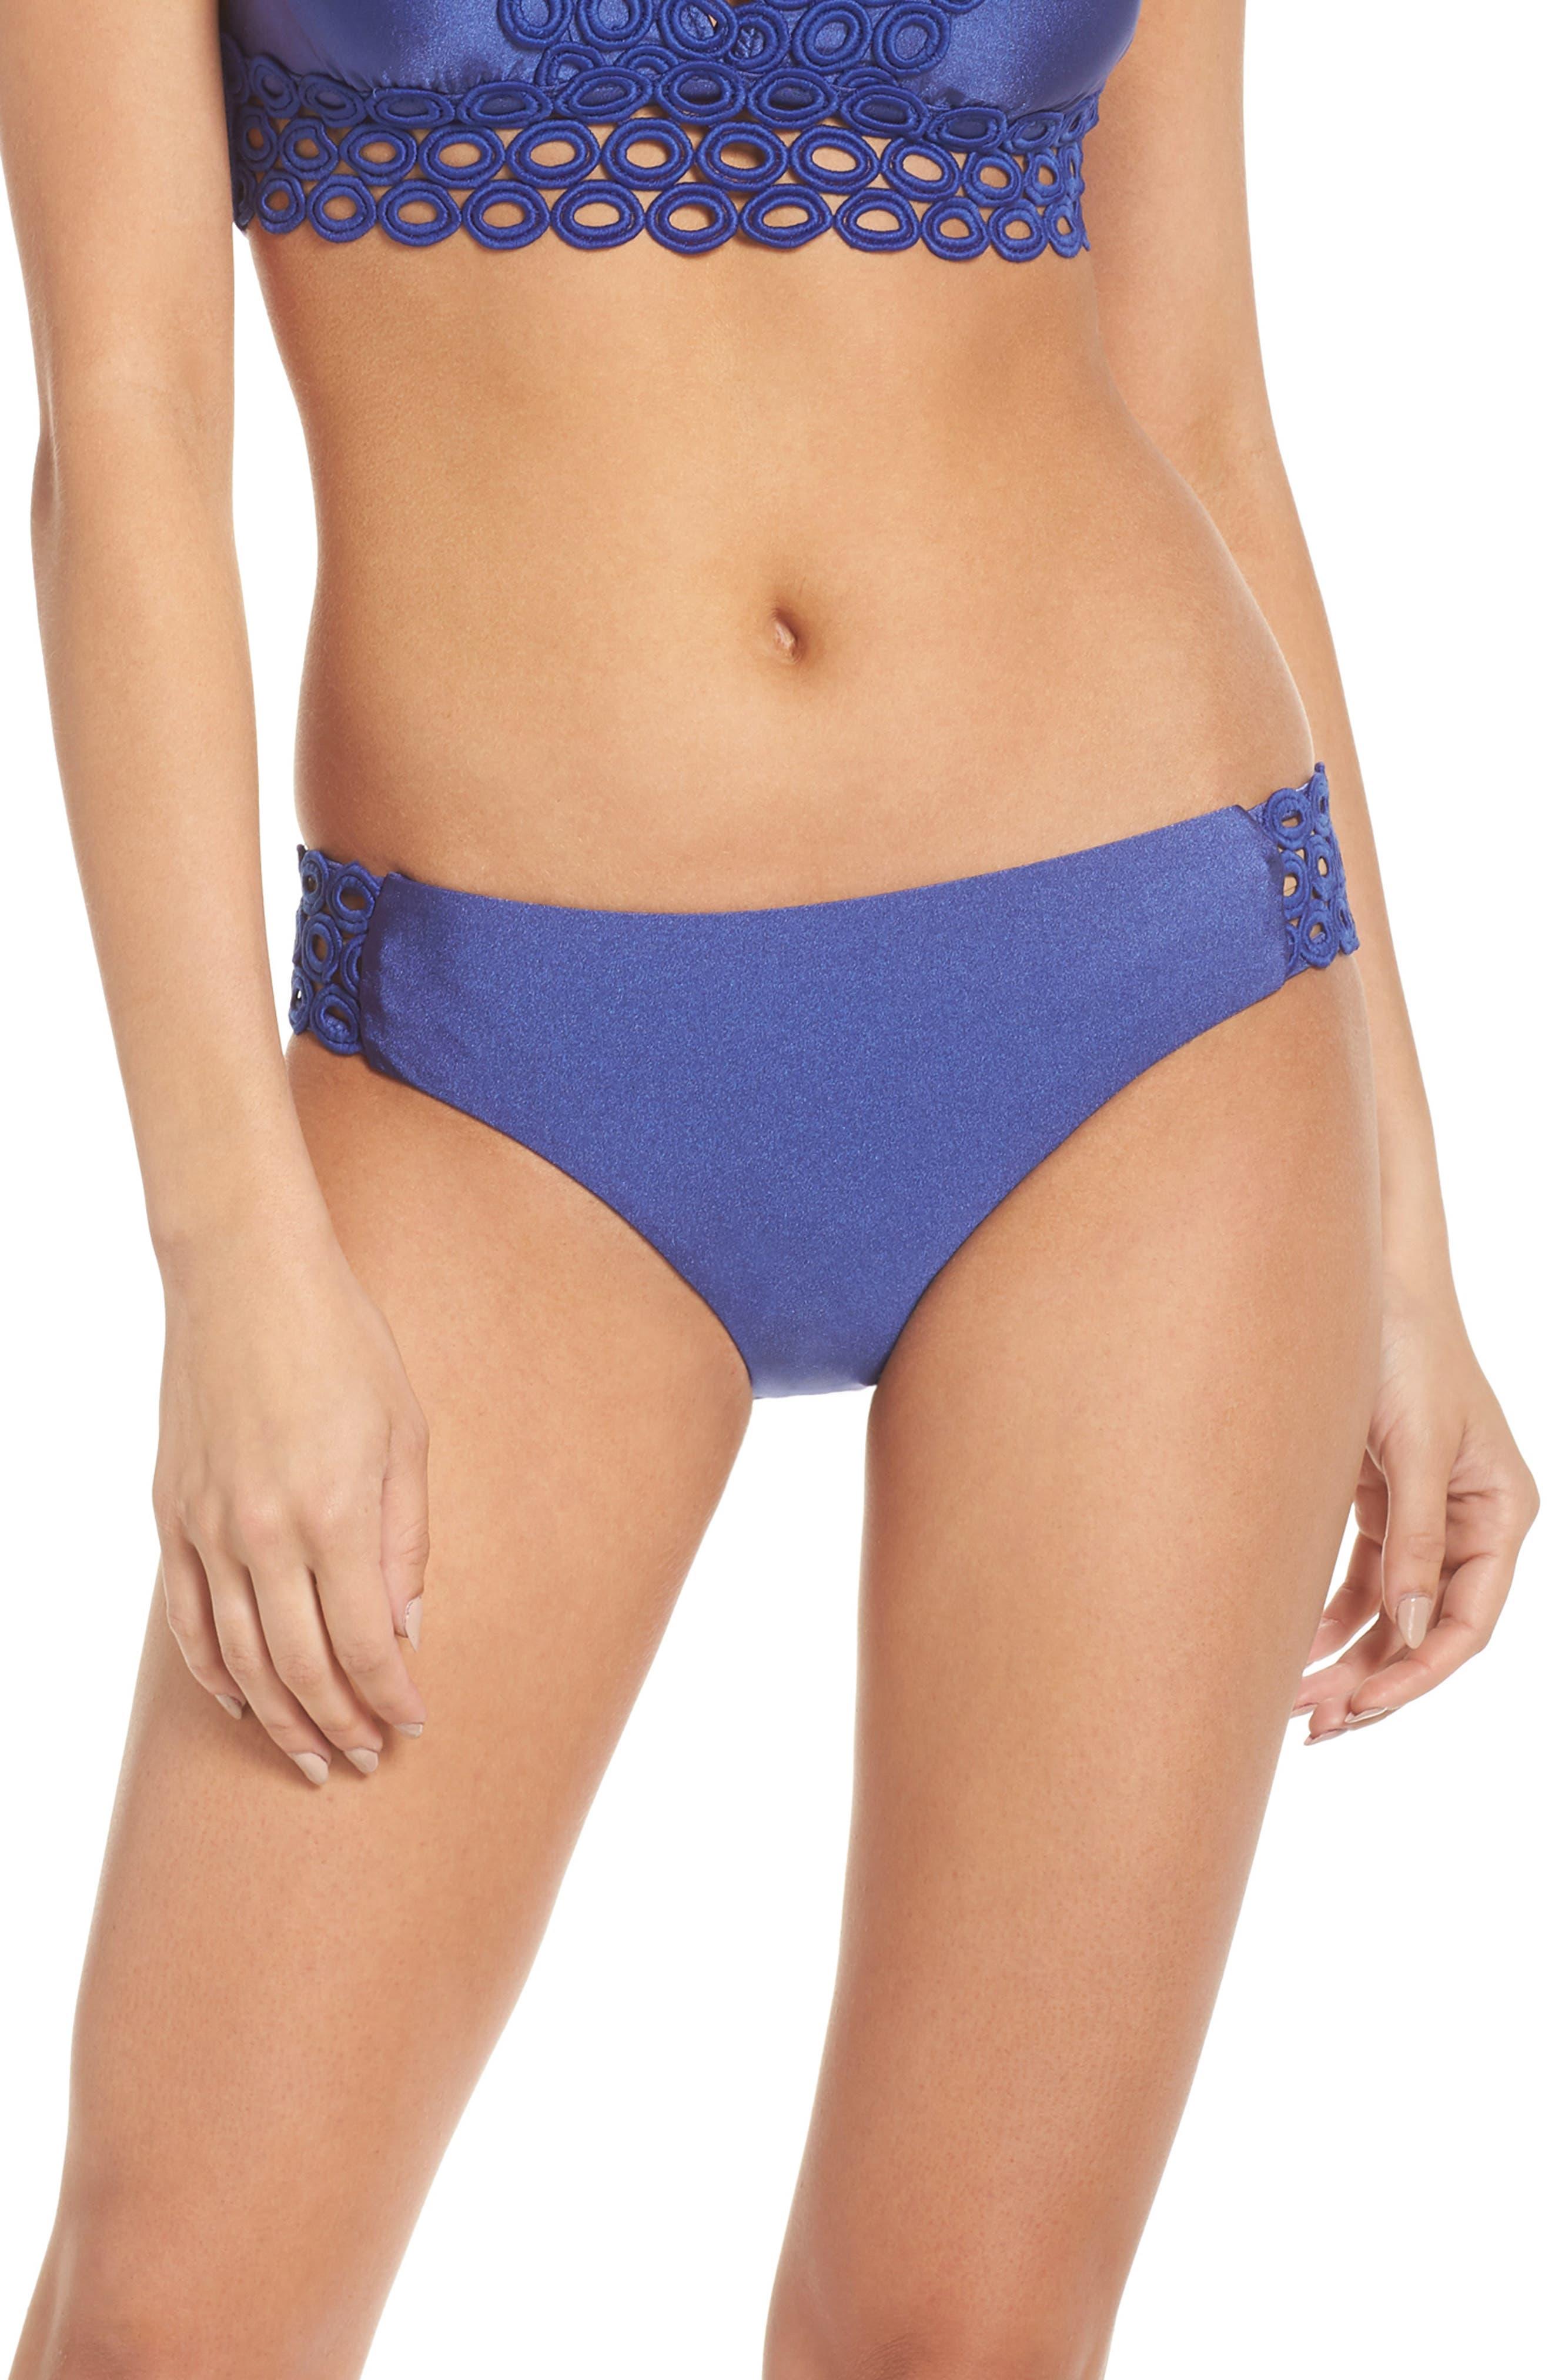 Siren Bikini Bottoms,                             Main thumbnail 1, color,                             BLUE TOPAZ